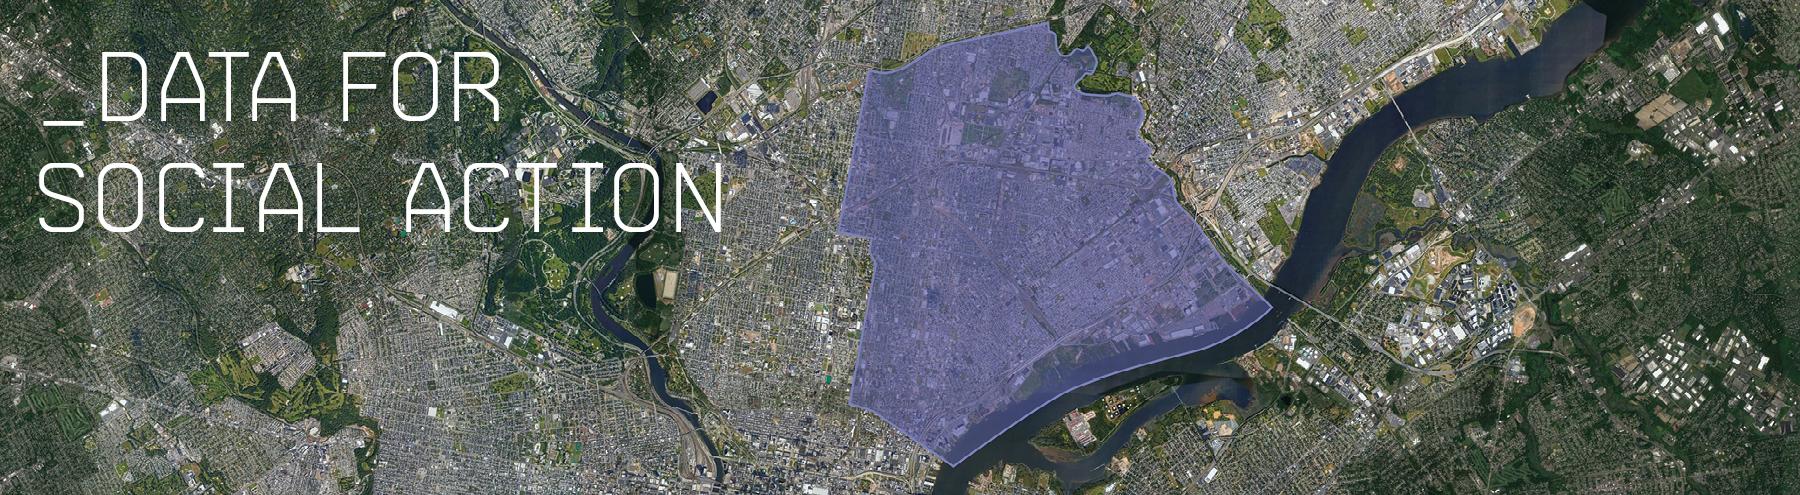 Data for Social Action